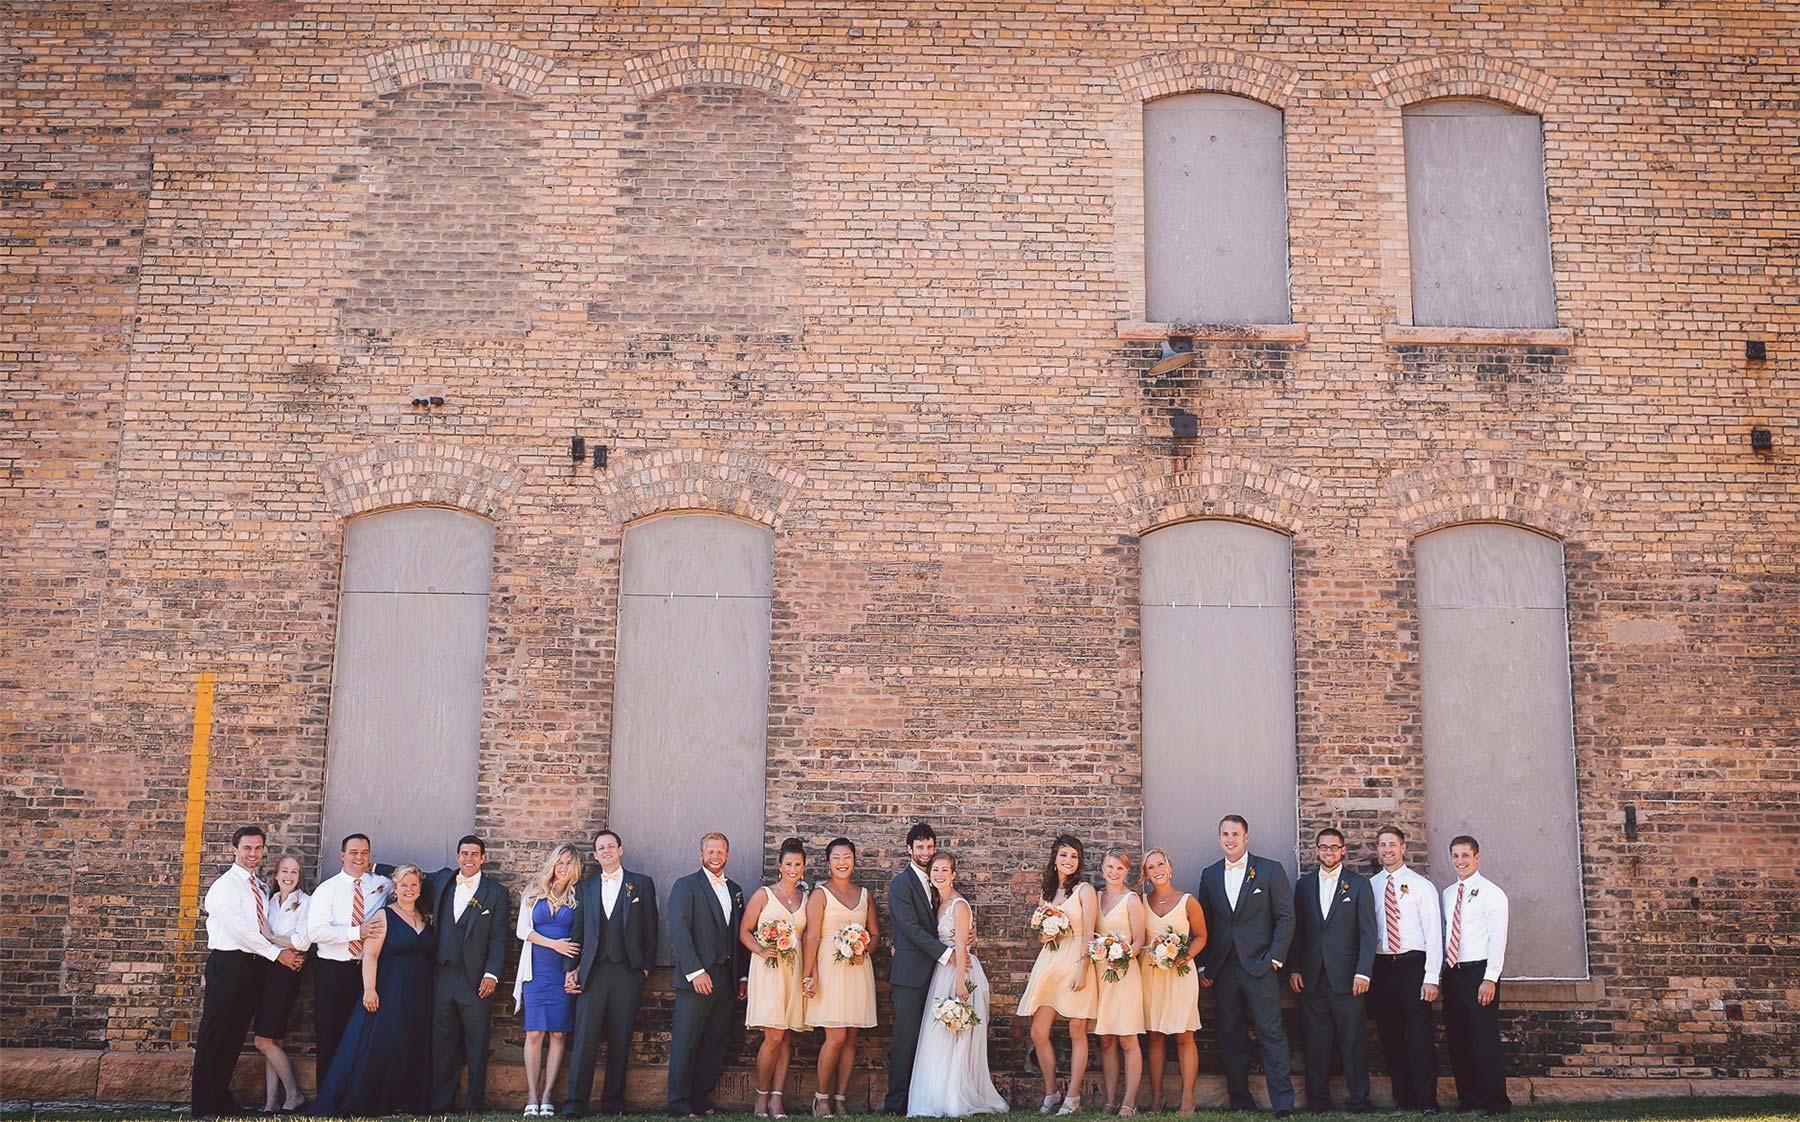 17-Minneapolis-Minnesota-Wedding-Photography-by-Vick-Photography-Downtown-Wedding-Party-Group-Sarah-&-Tom.jpg